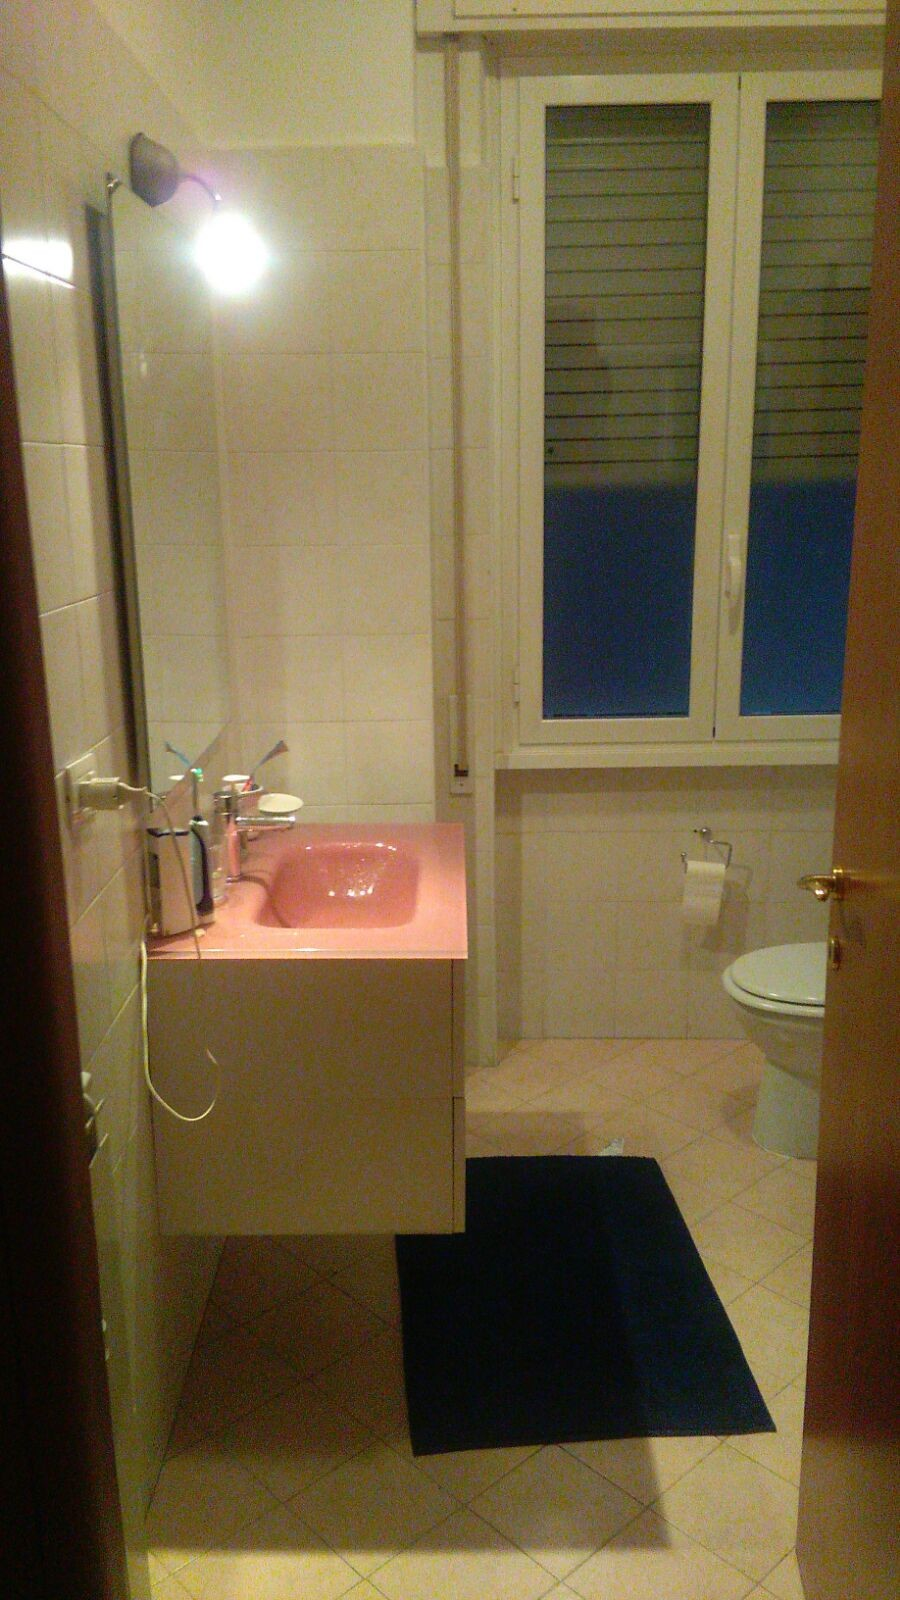 Camera roma nomentana room for rent rome for Camera roma